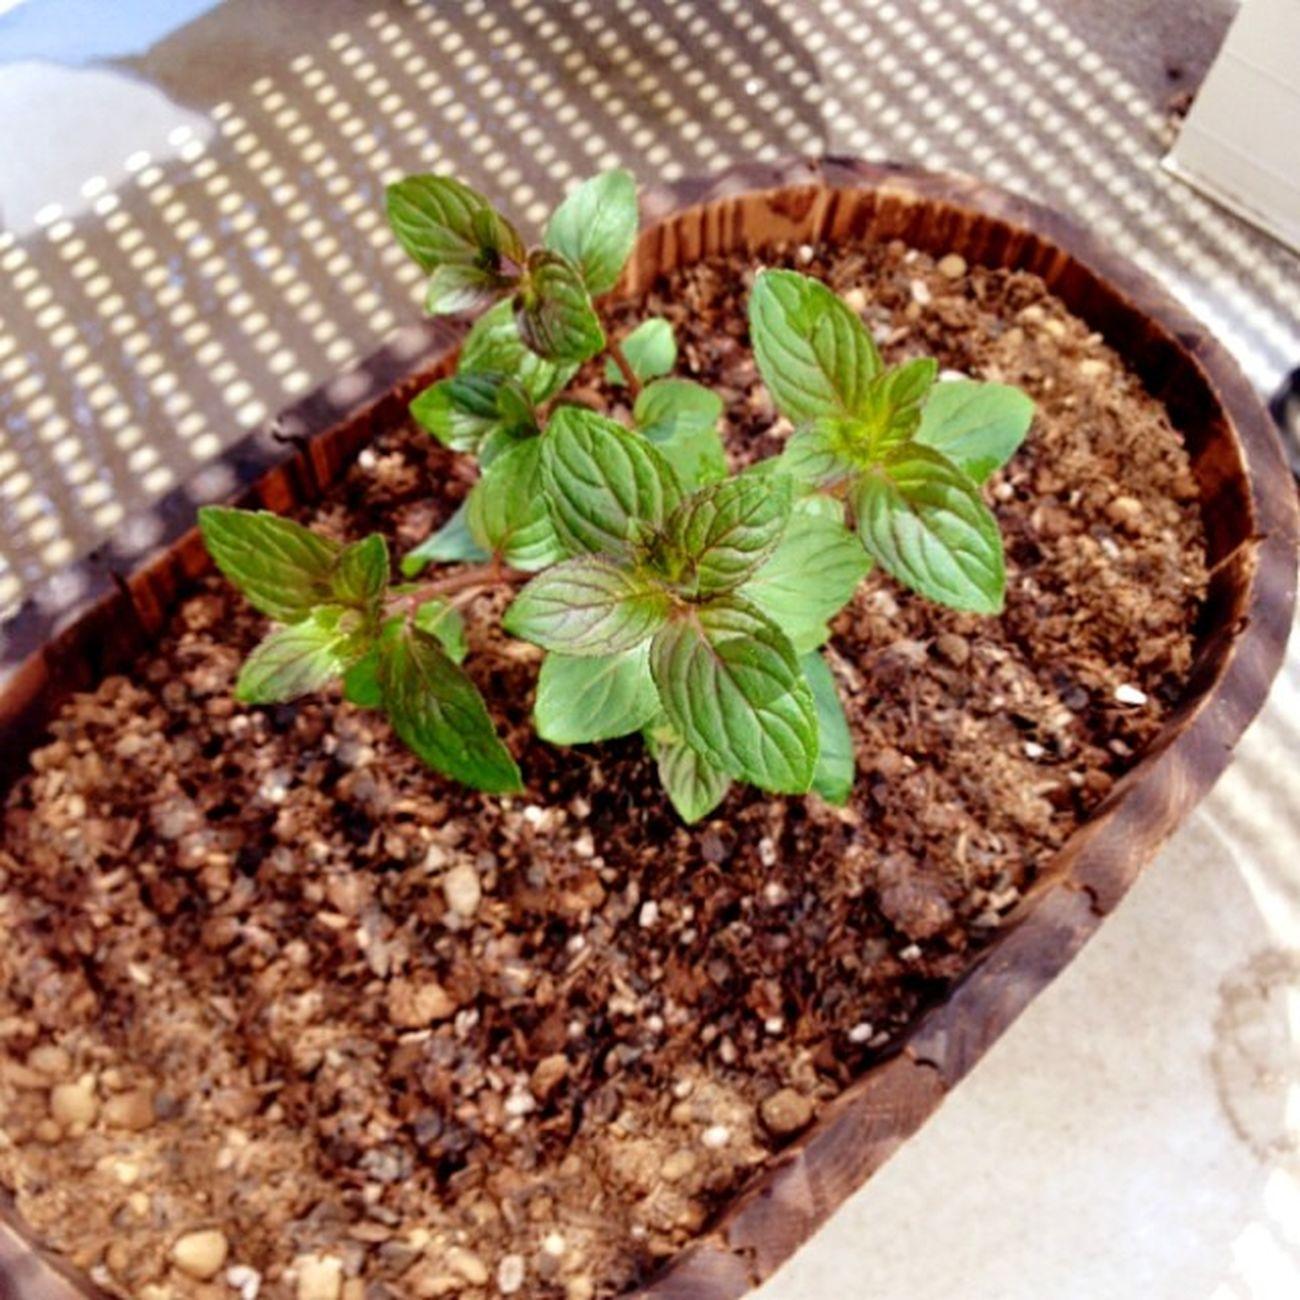 Green Mint ミント Blackpeppermint